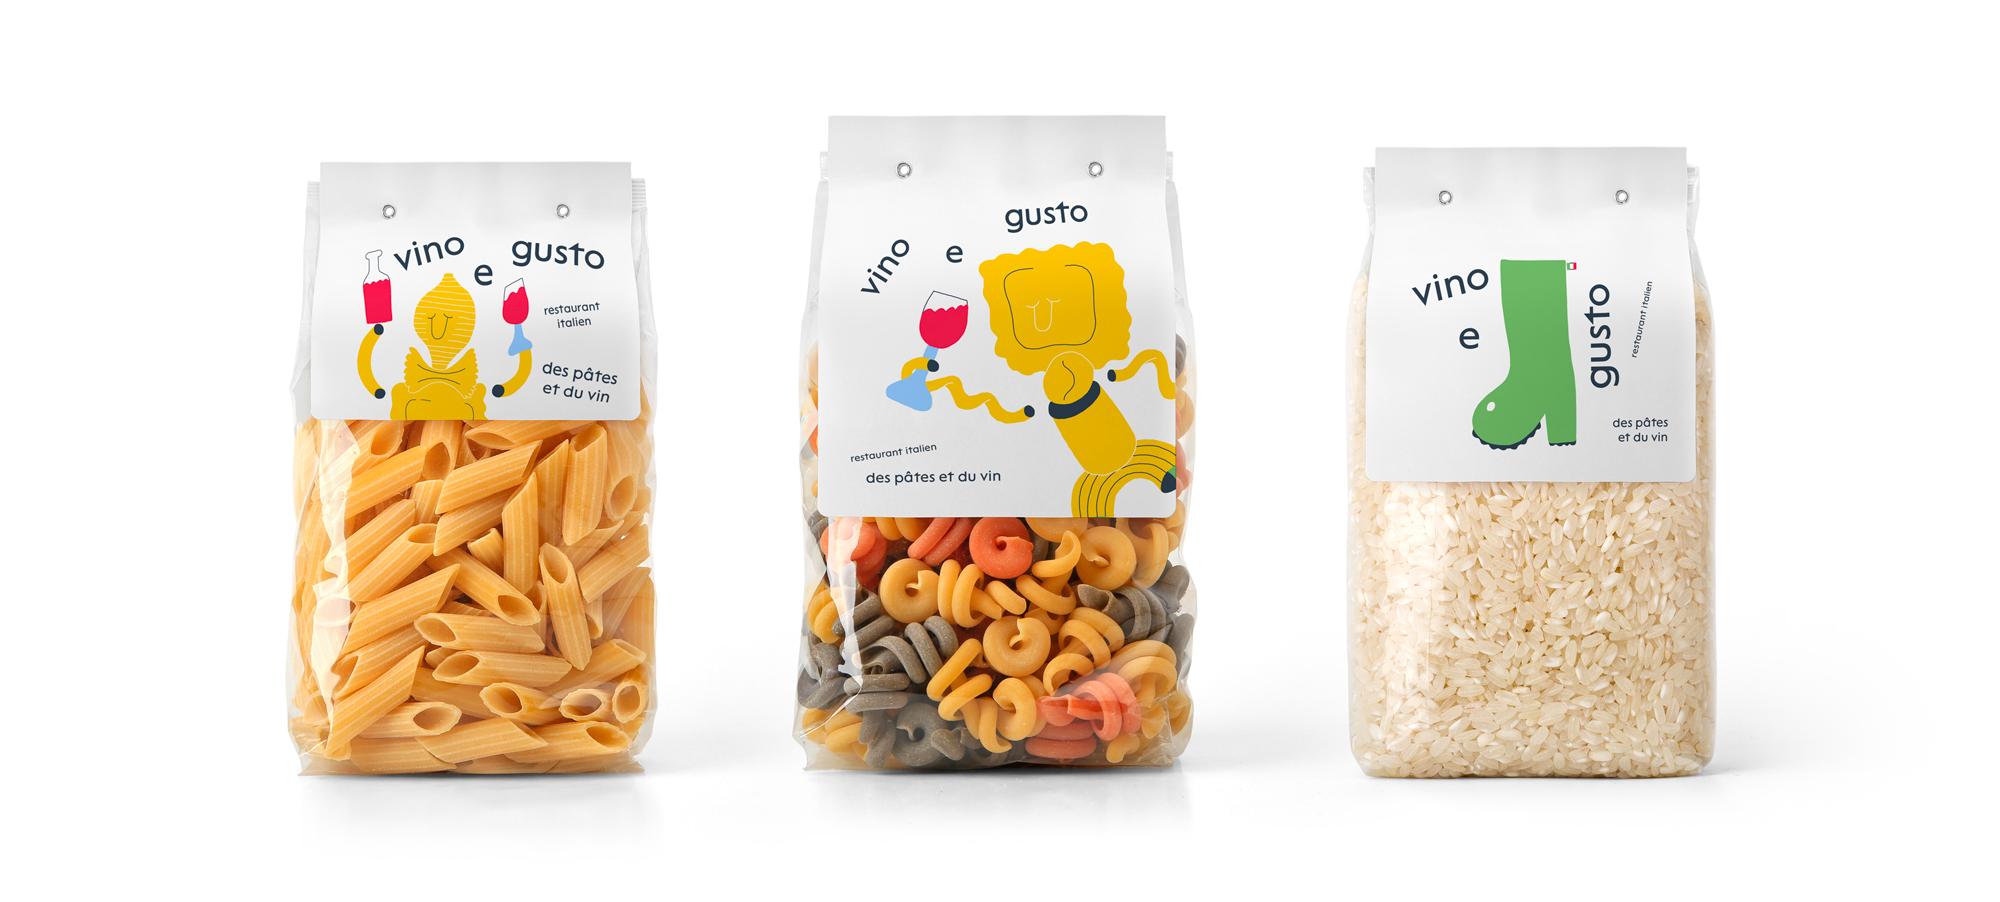 création illustration packaging identité visuelle restaurant rennes